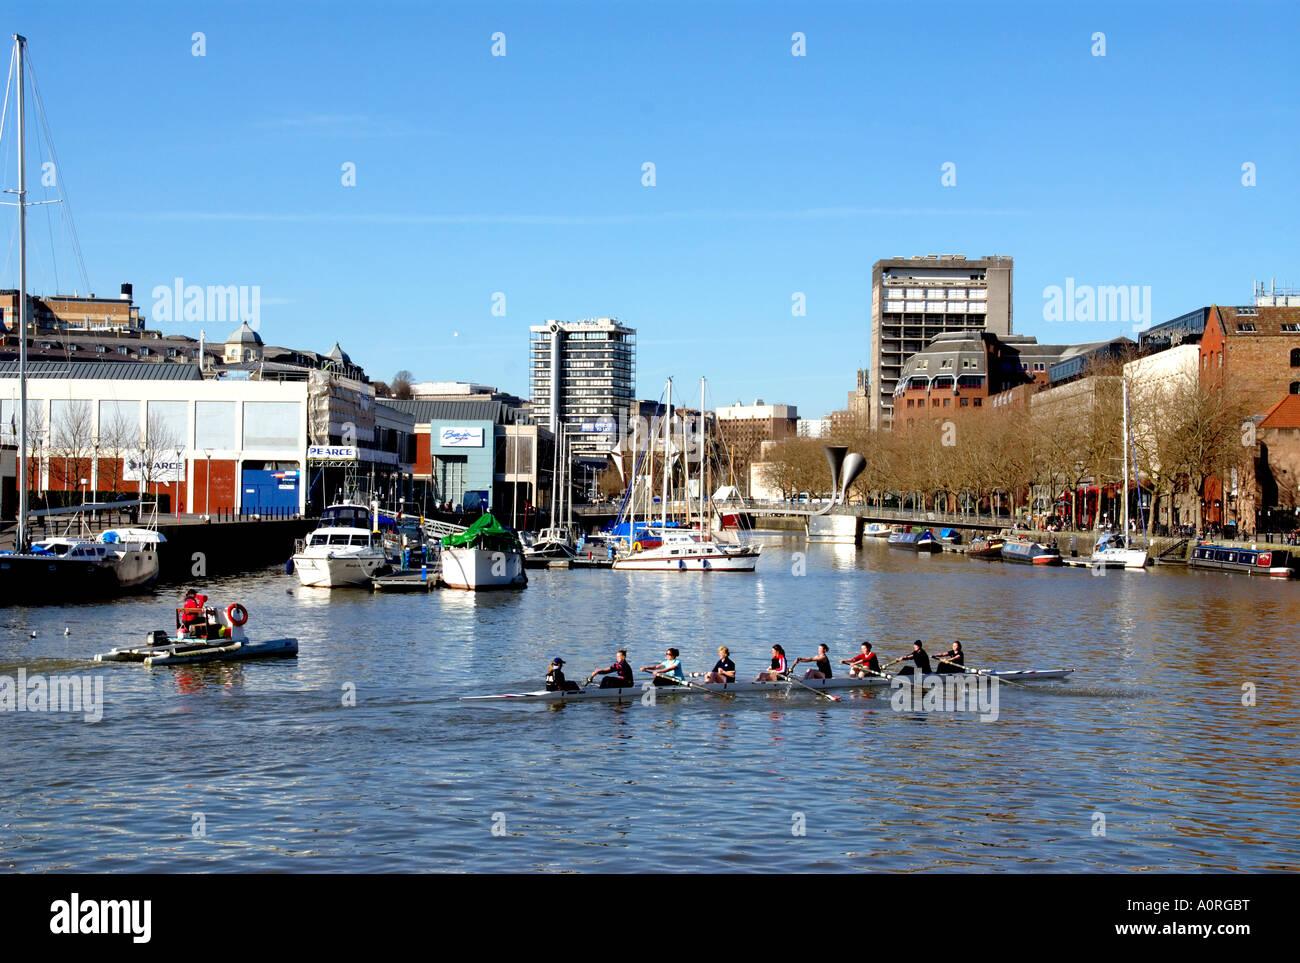 Docks Bristol England United Kingdom Europe - Stock Image